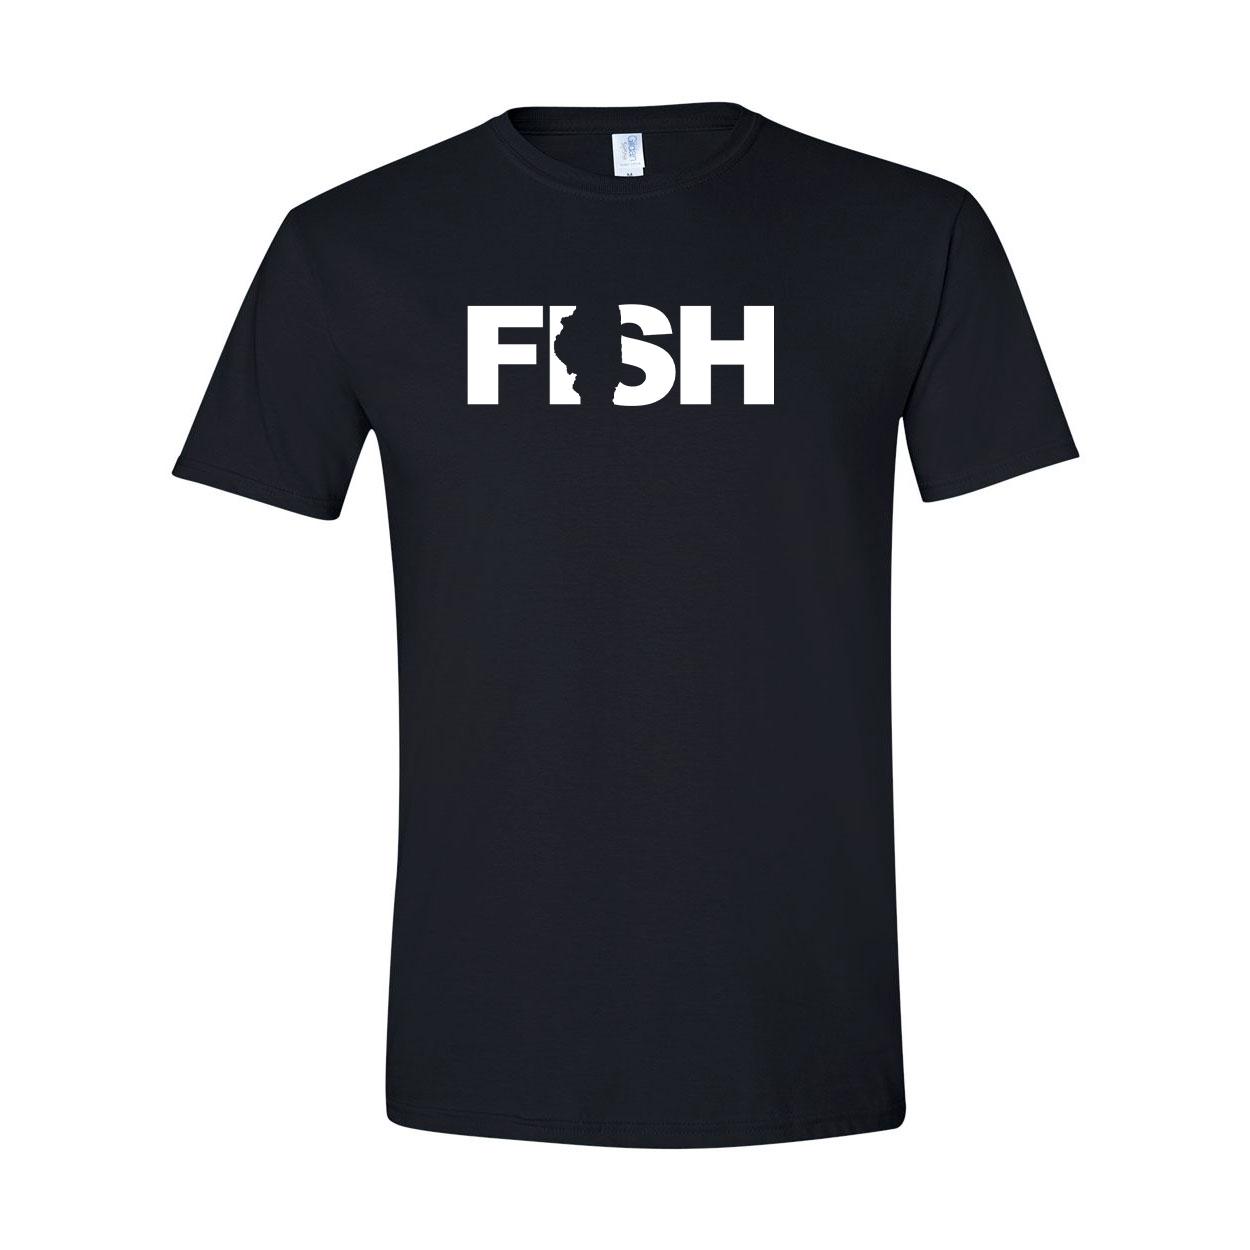 Fish Illinois Classic T-Shirt Black (White Logo)